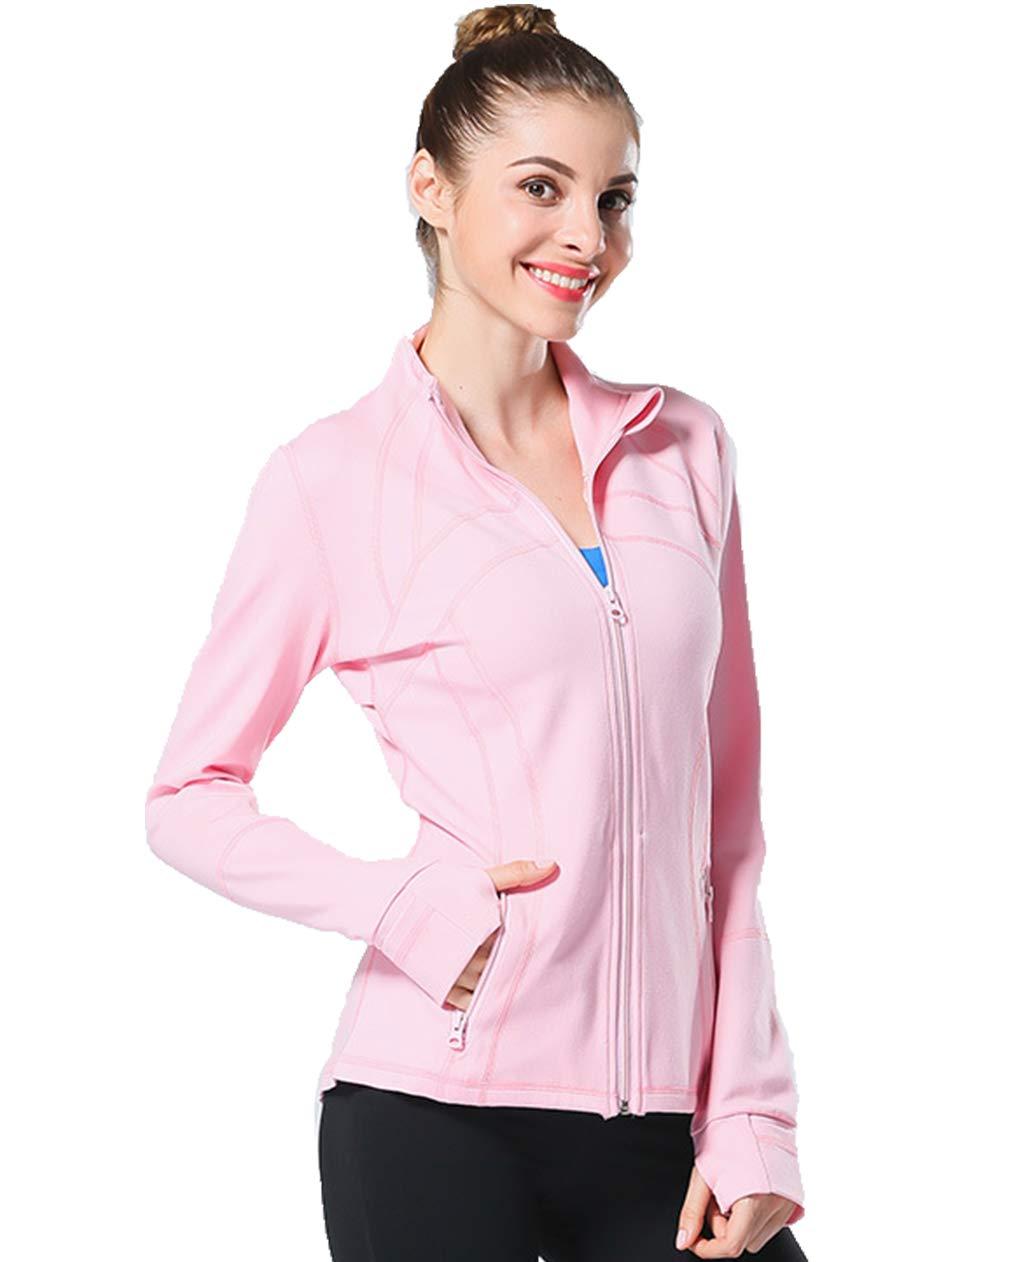 UDIY Women's Athletic Jacket Full Zip Stretchy Running Yoga Track Jacket with Pockets Pink by UDIY